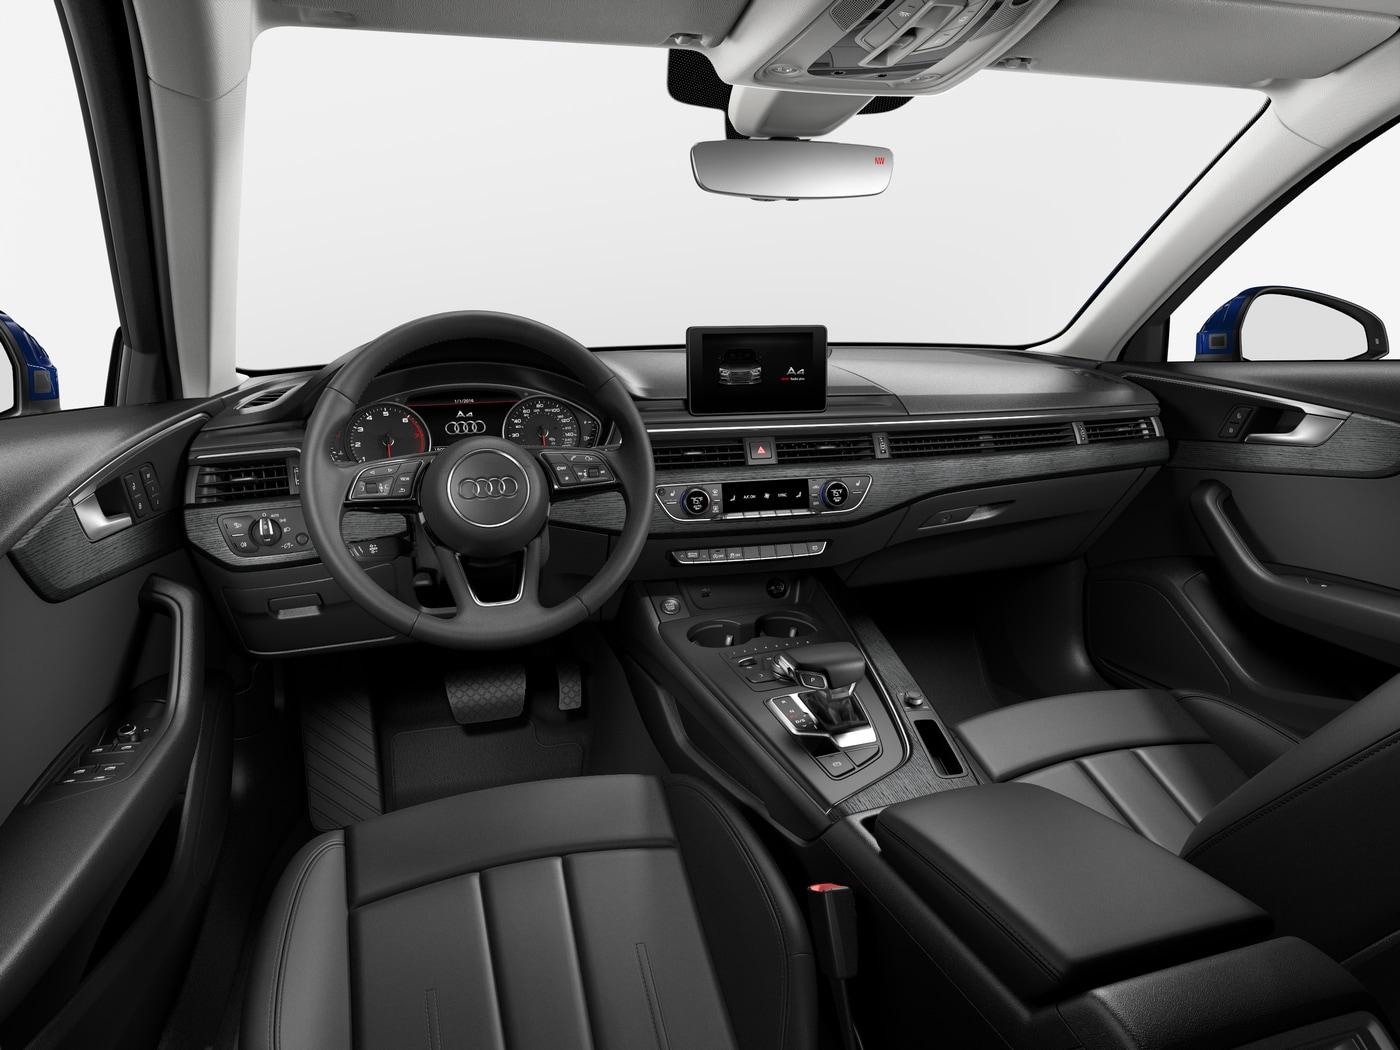 New 2019 Audi A4 Sedan 2 0T Premium Navarra blue metallic